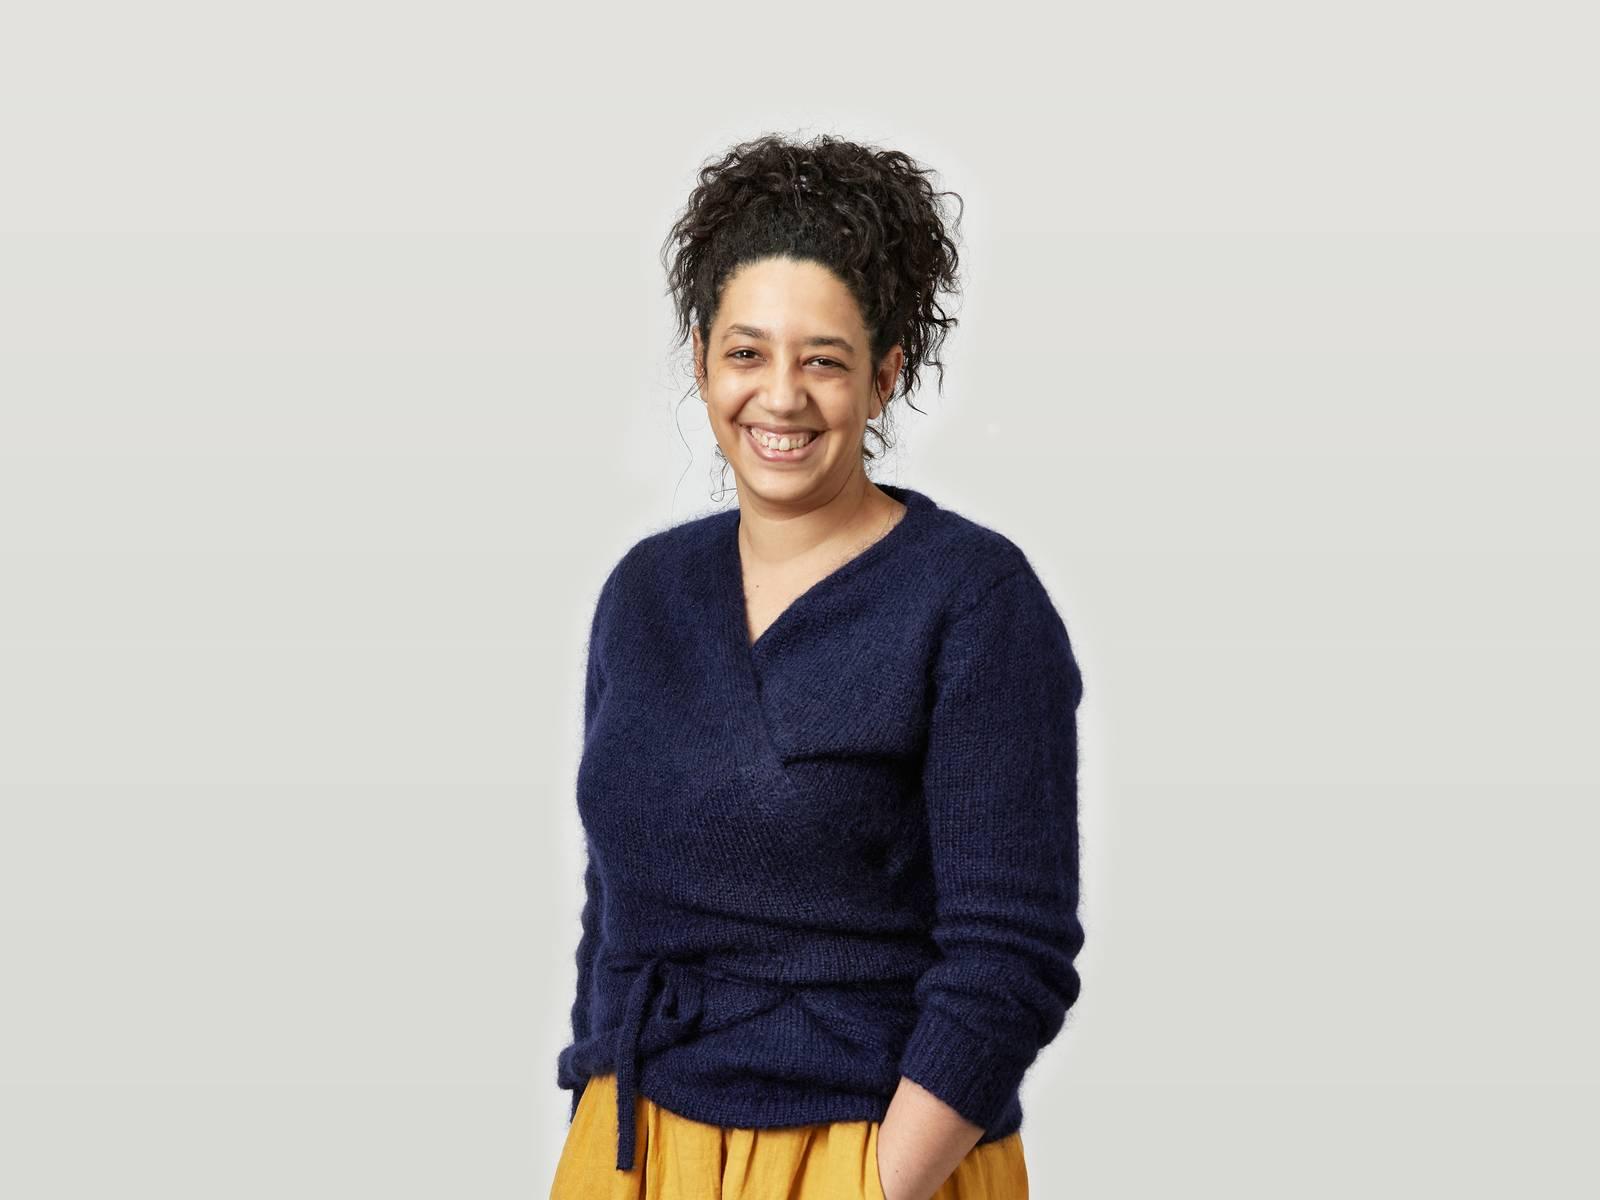 A profile image of Melissa David